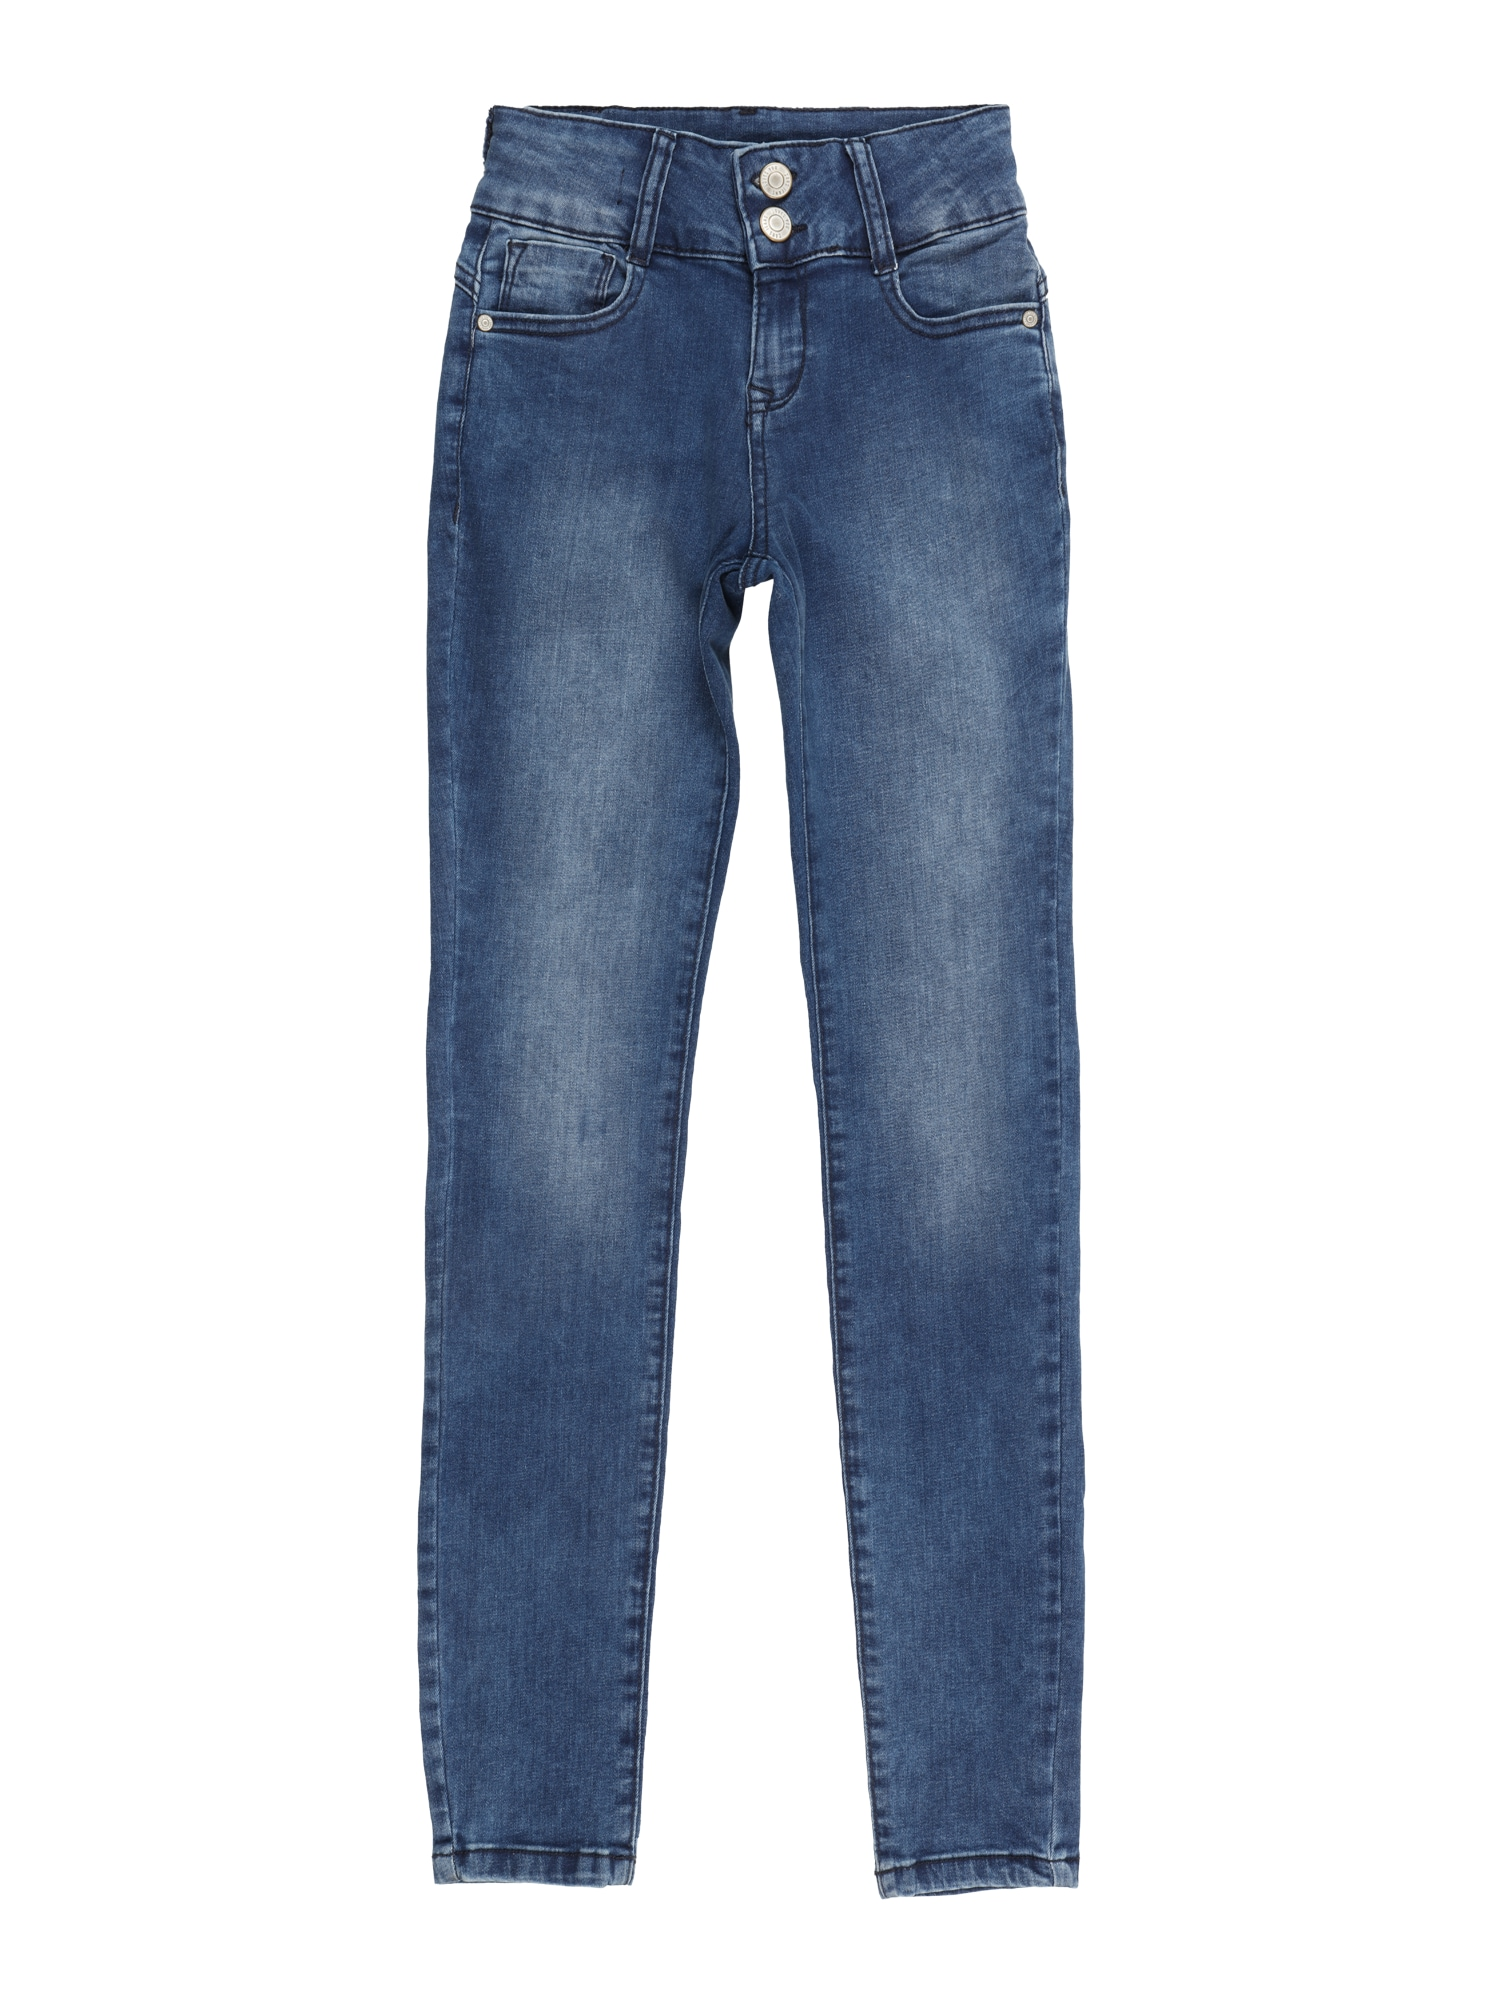 Cars Jeans Džinsai tamsiai mėlyna